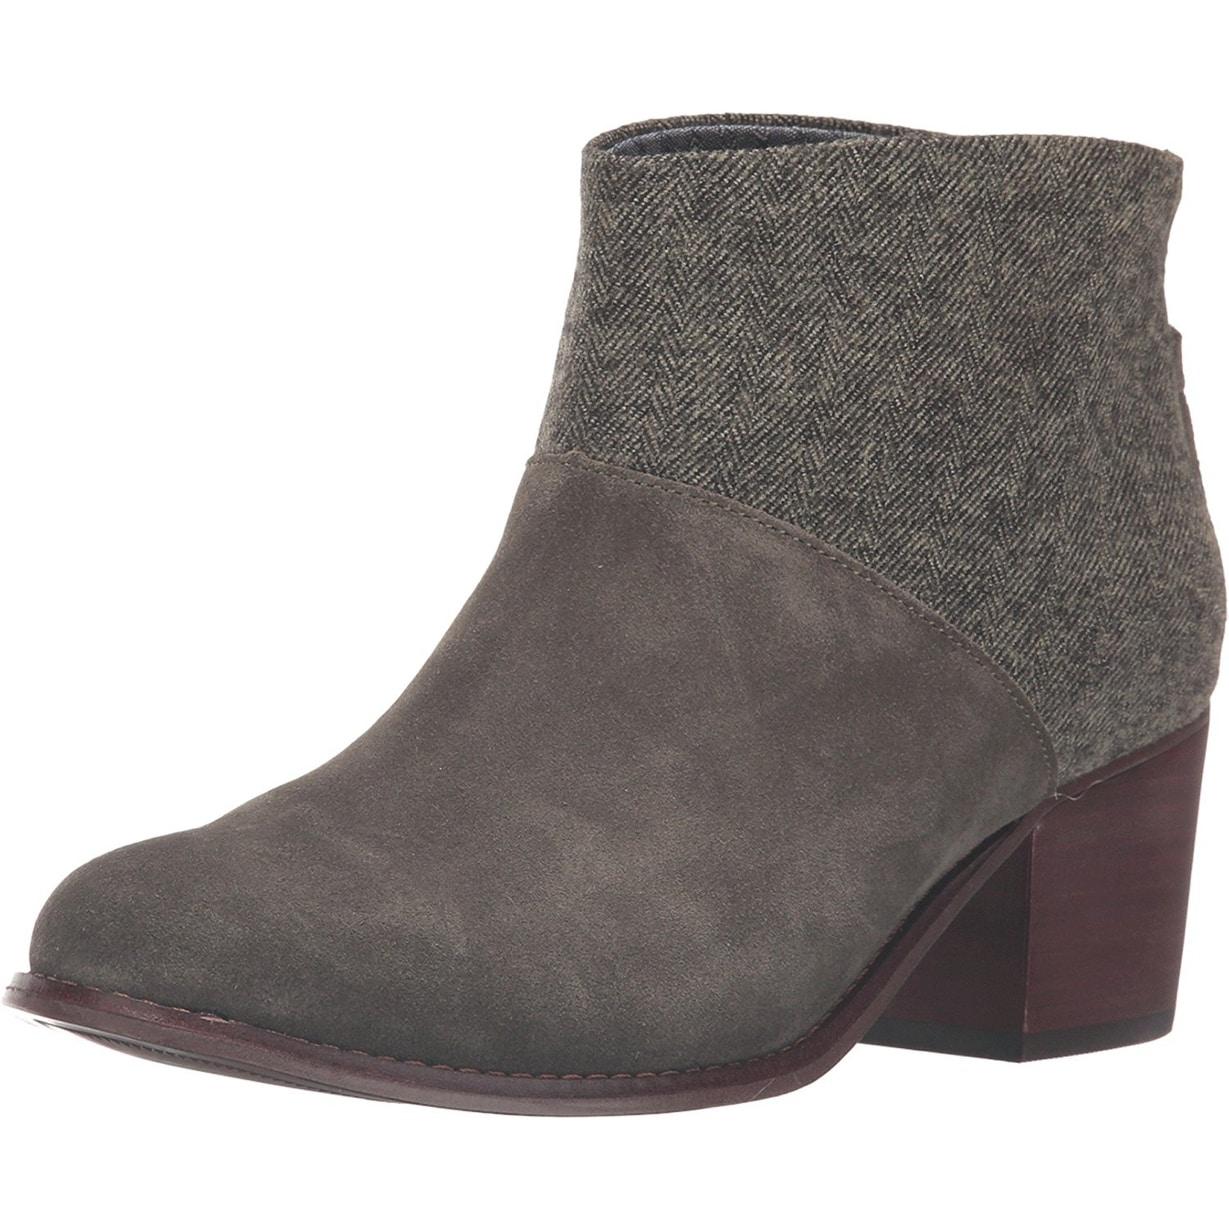 1cbaf915d11 Toms Women's Leila Bootie Boots